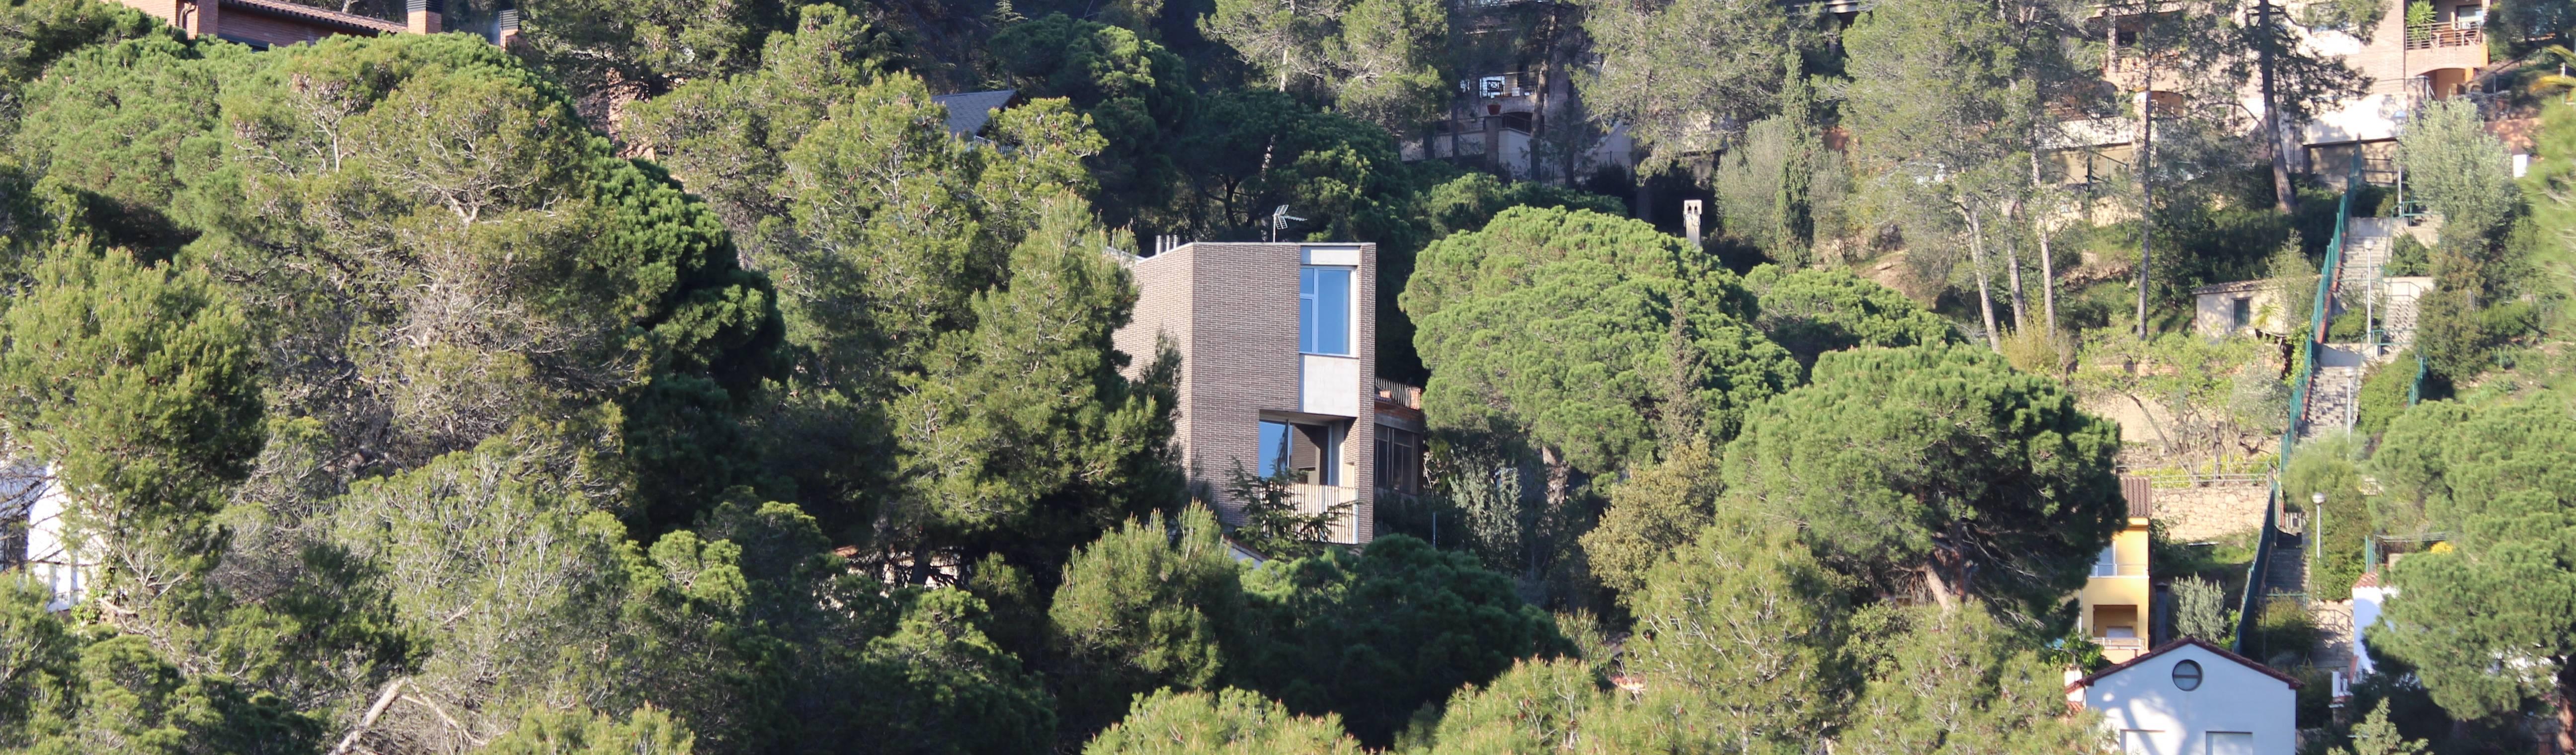 Mcimarquitectura arquitectos en sant cugat del valles homify - Alfombras sant cugat ...